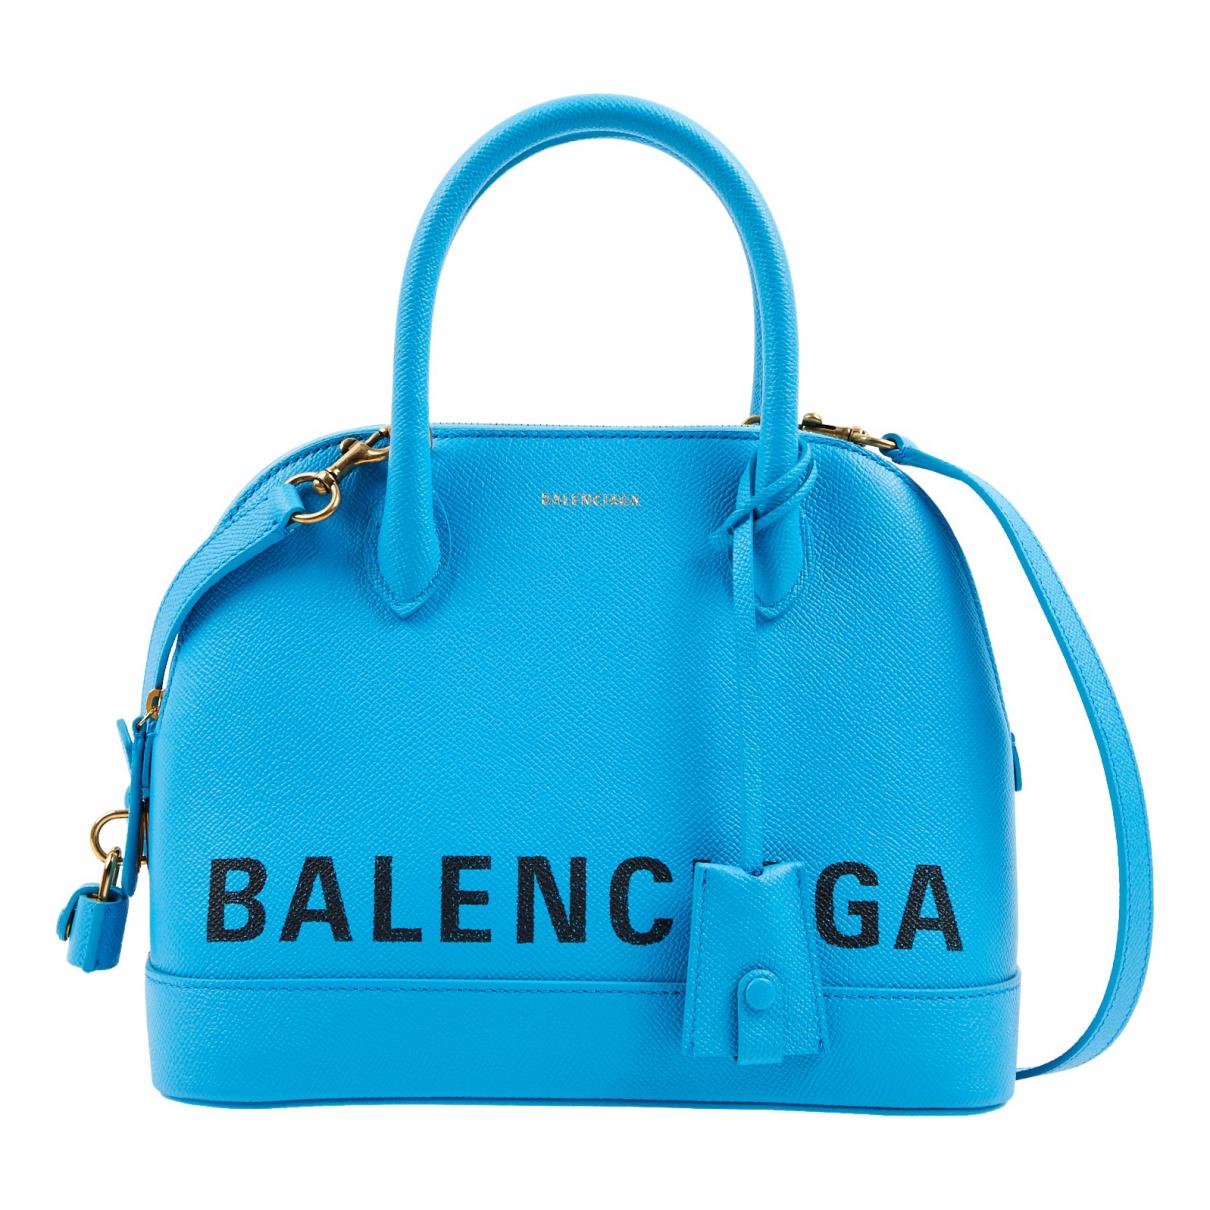 Balenciaga - Sac a main Ville Top Handle pour femme en cuir - turquoise